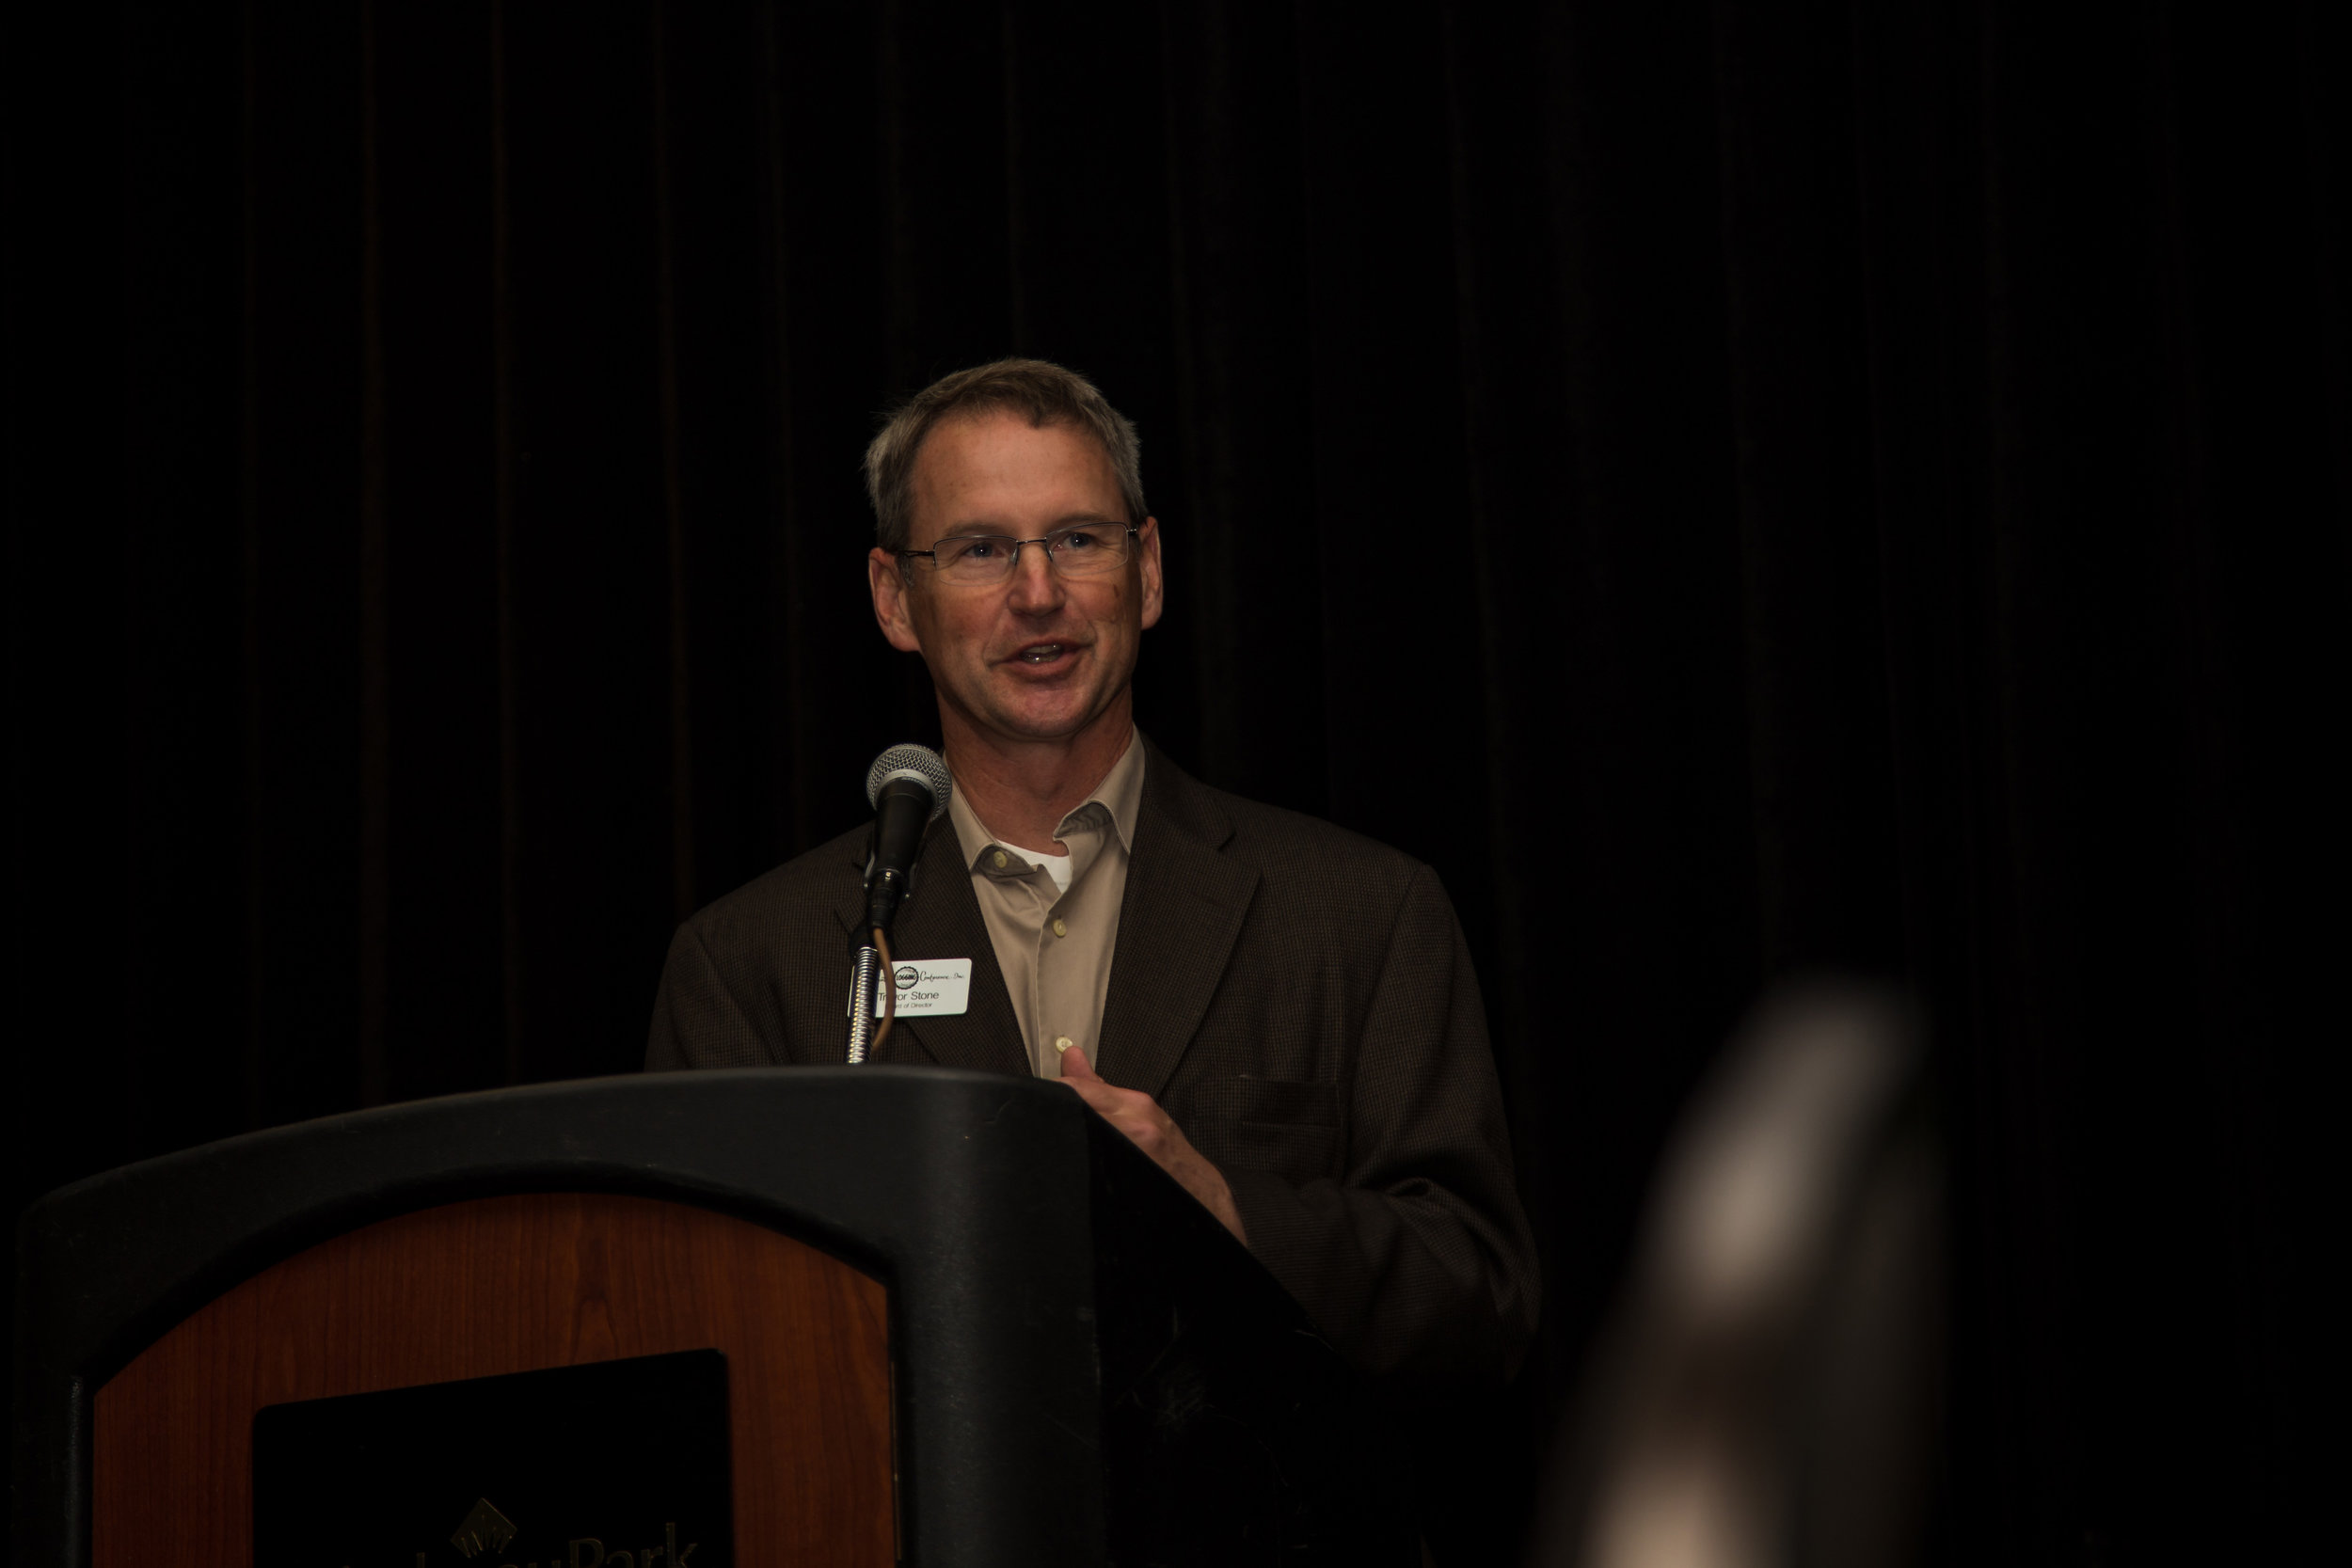 Trevor Stone ILC President